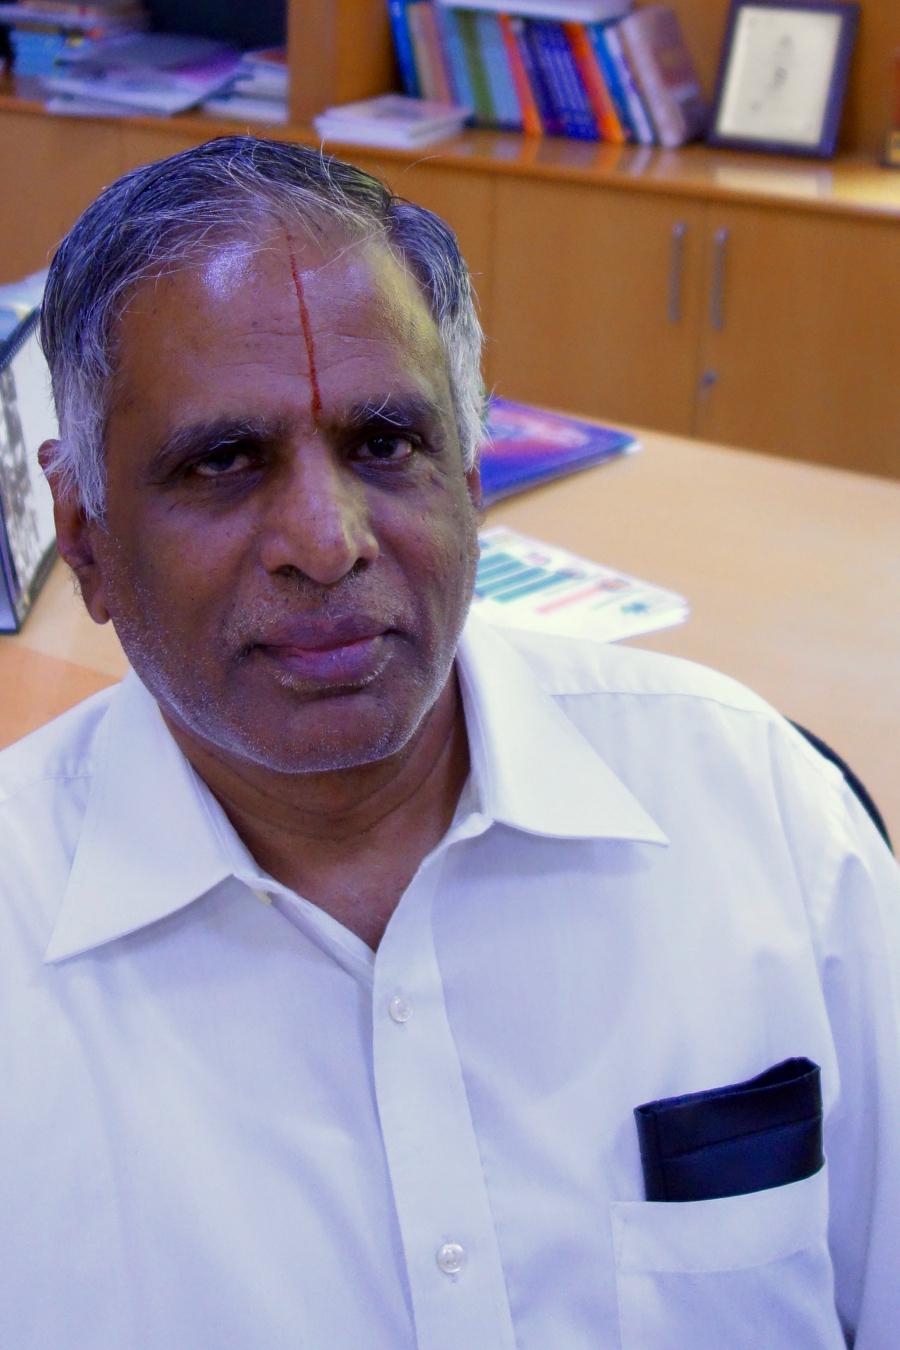 Professor S. Sadagopan heads Bangalore's International Institute for Information Technology